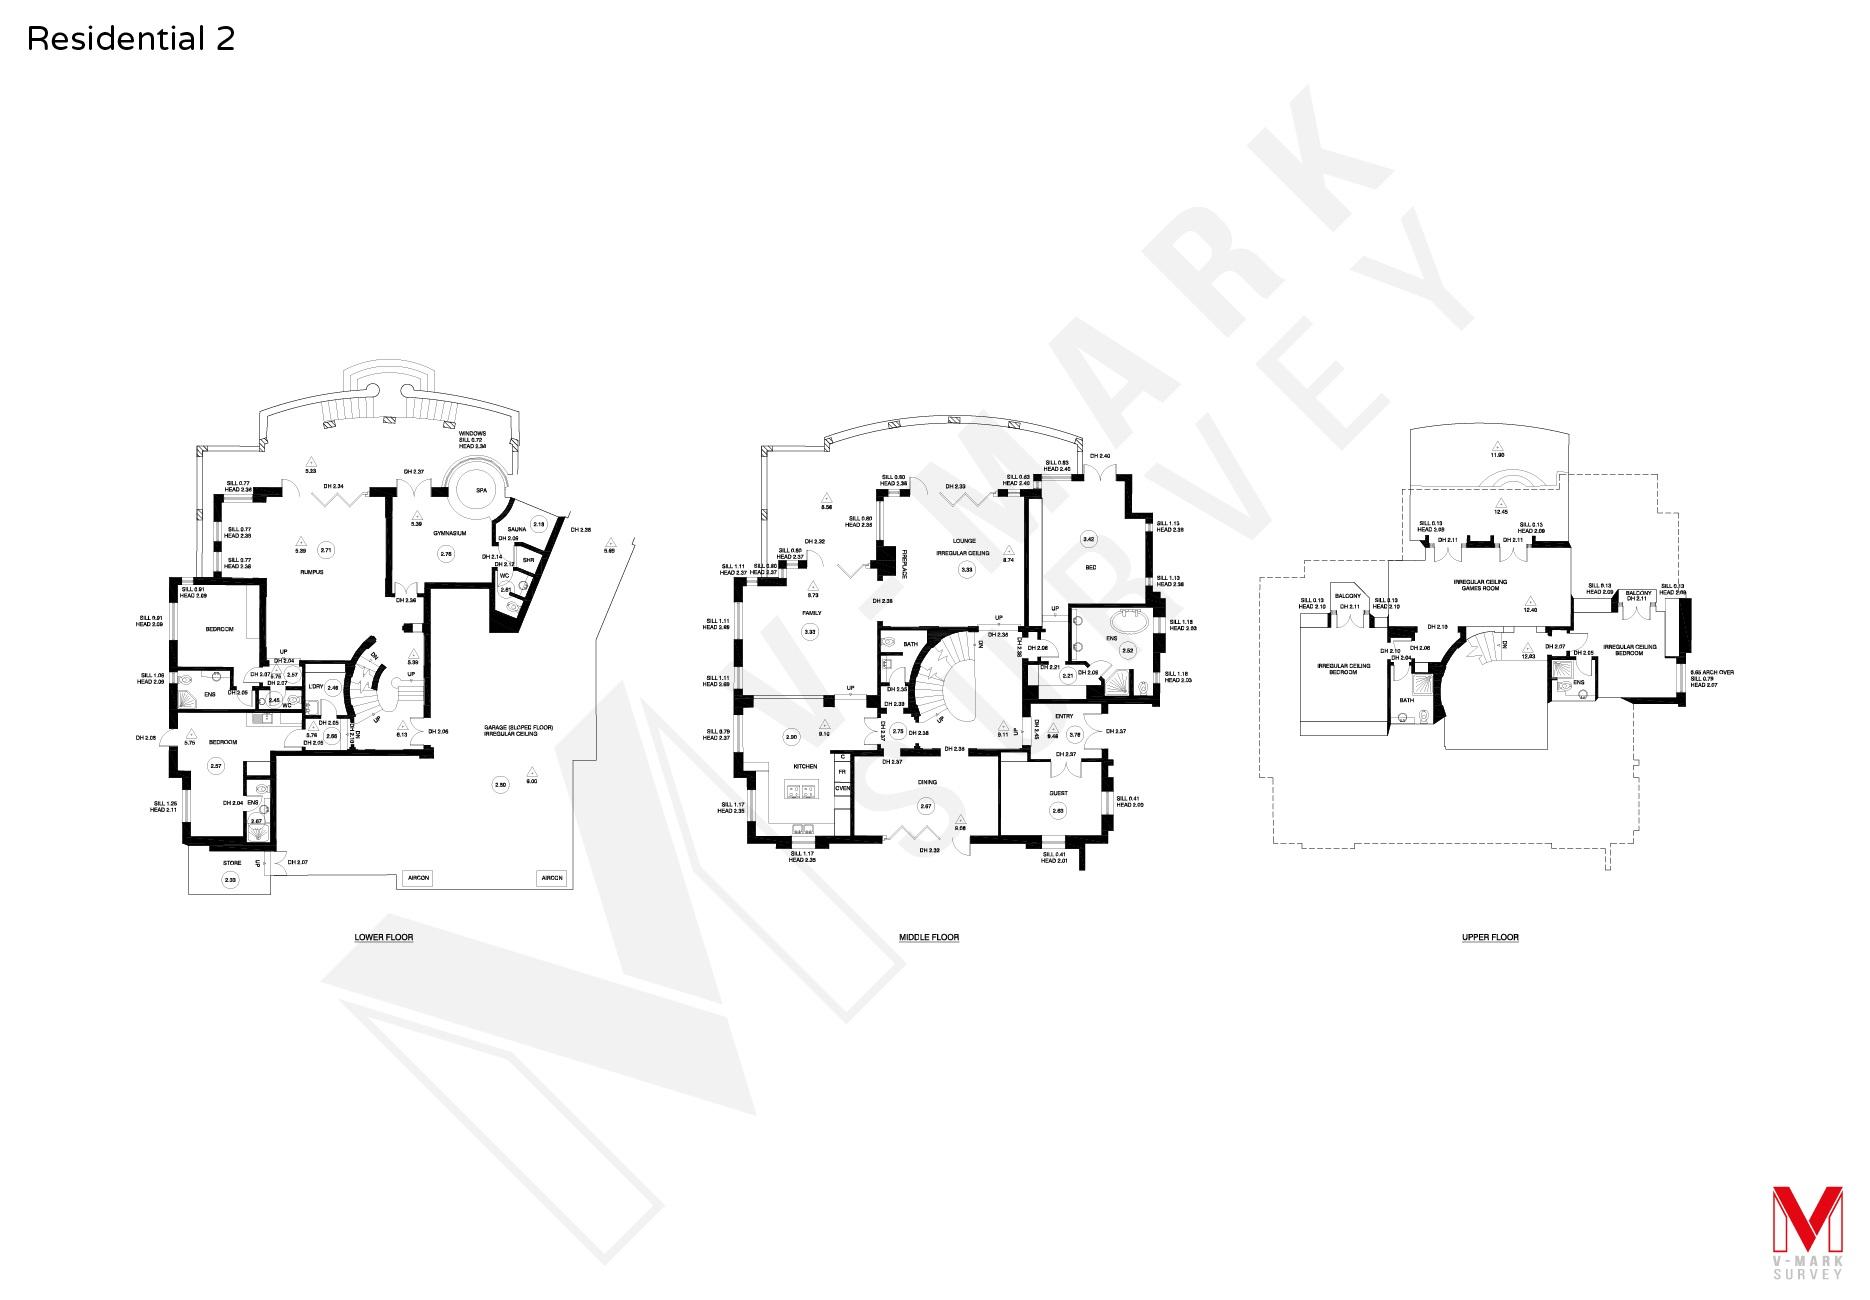 Residential Floorplans